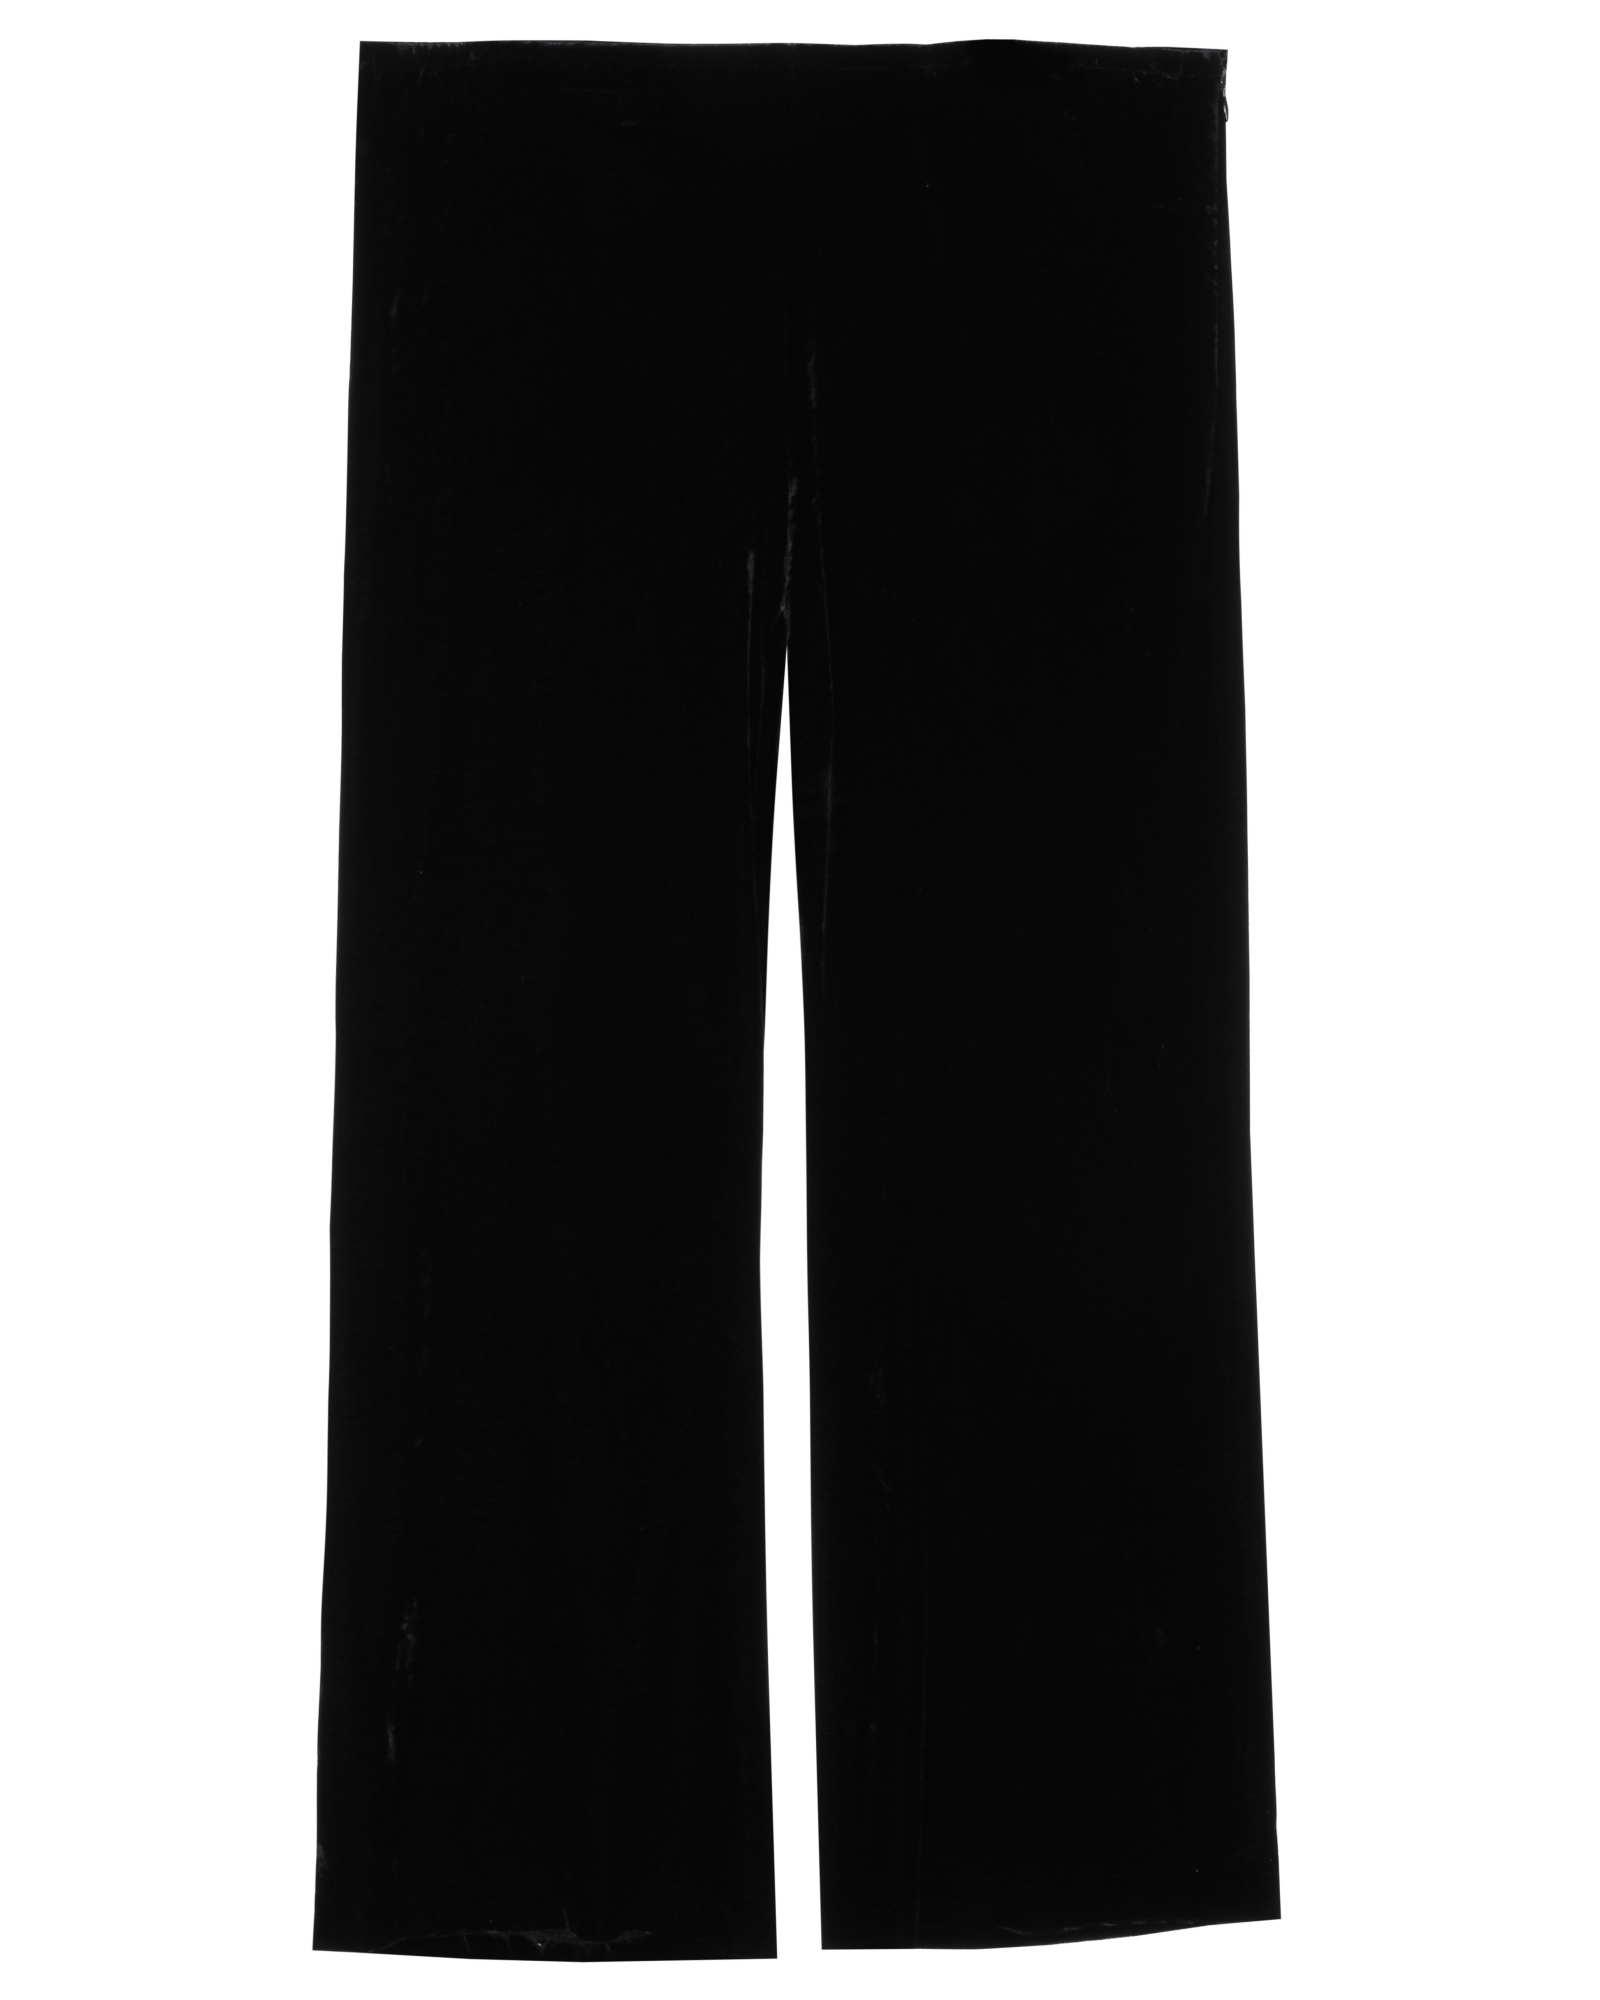 Washable Stretch Velvet Pant